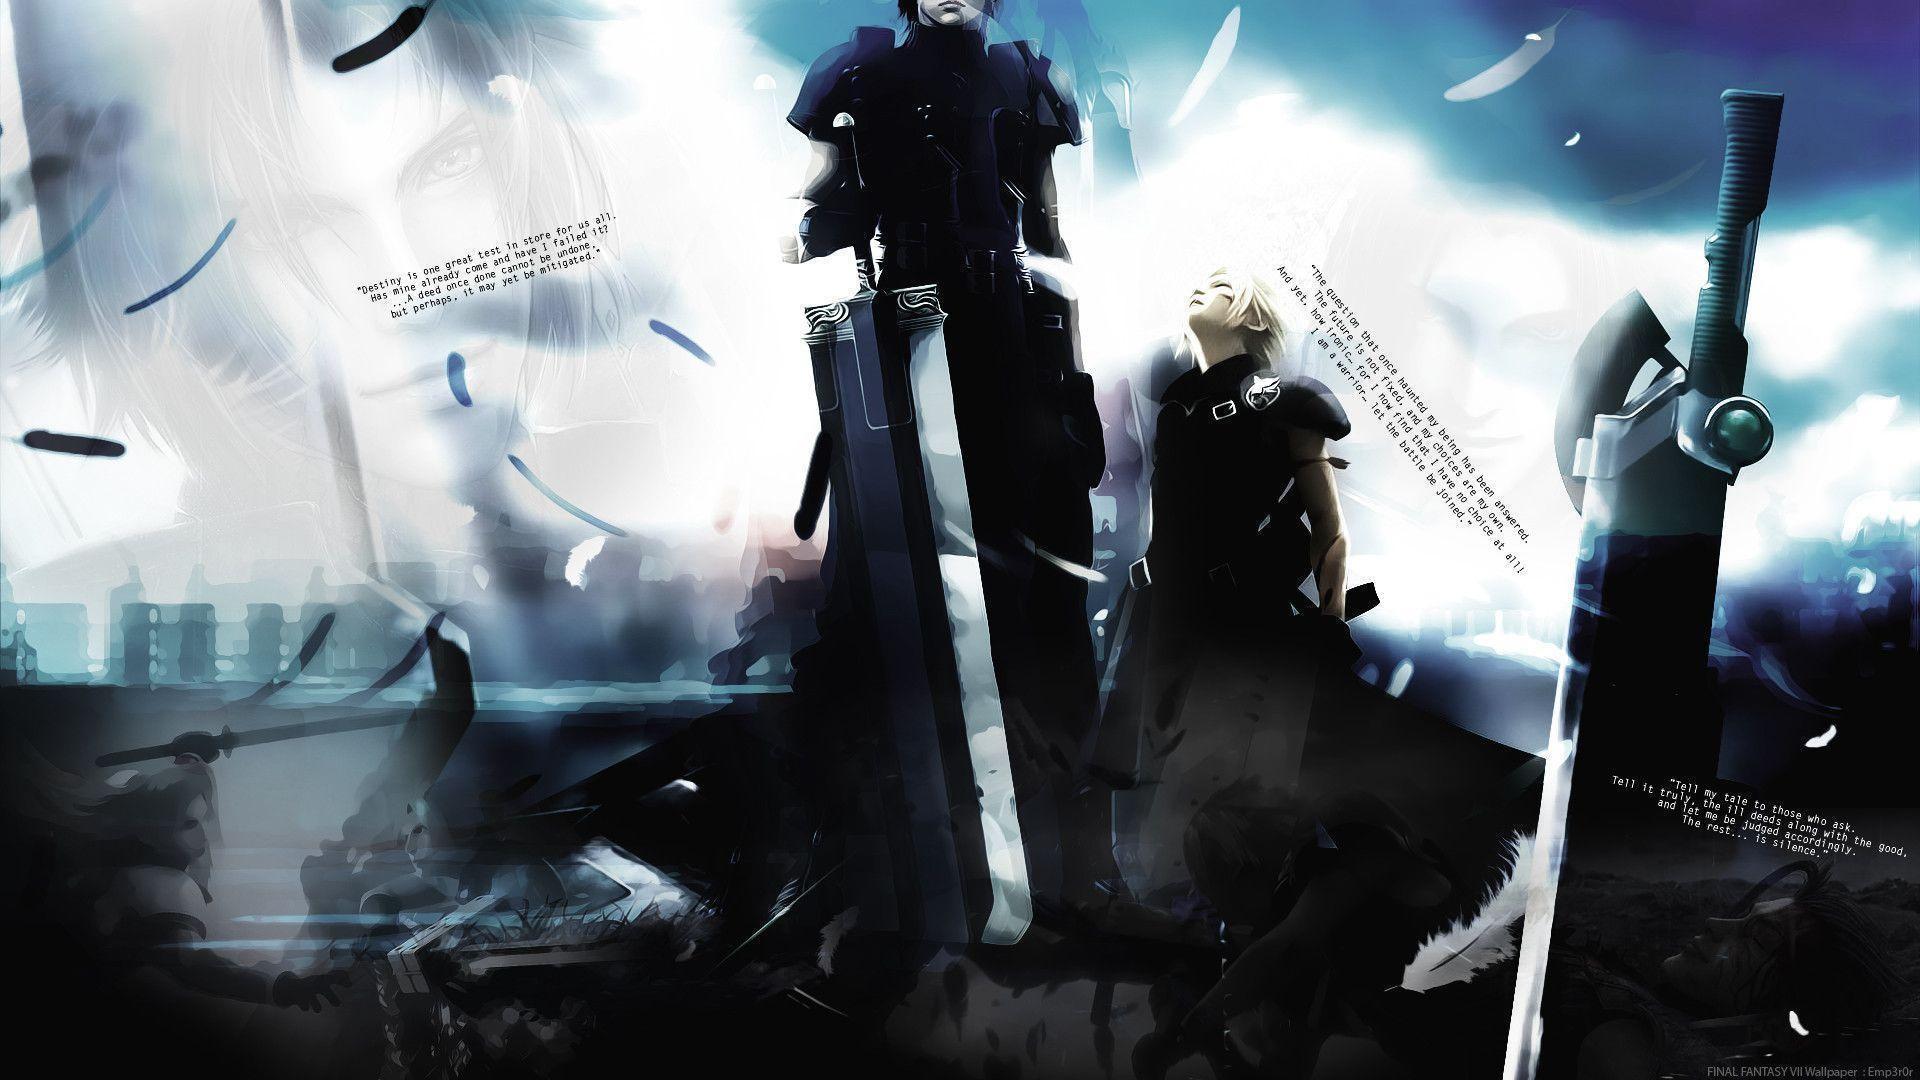 Wallpapers For > Final Fantasy 7 Wallpaper Hd